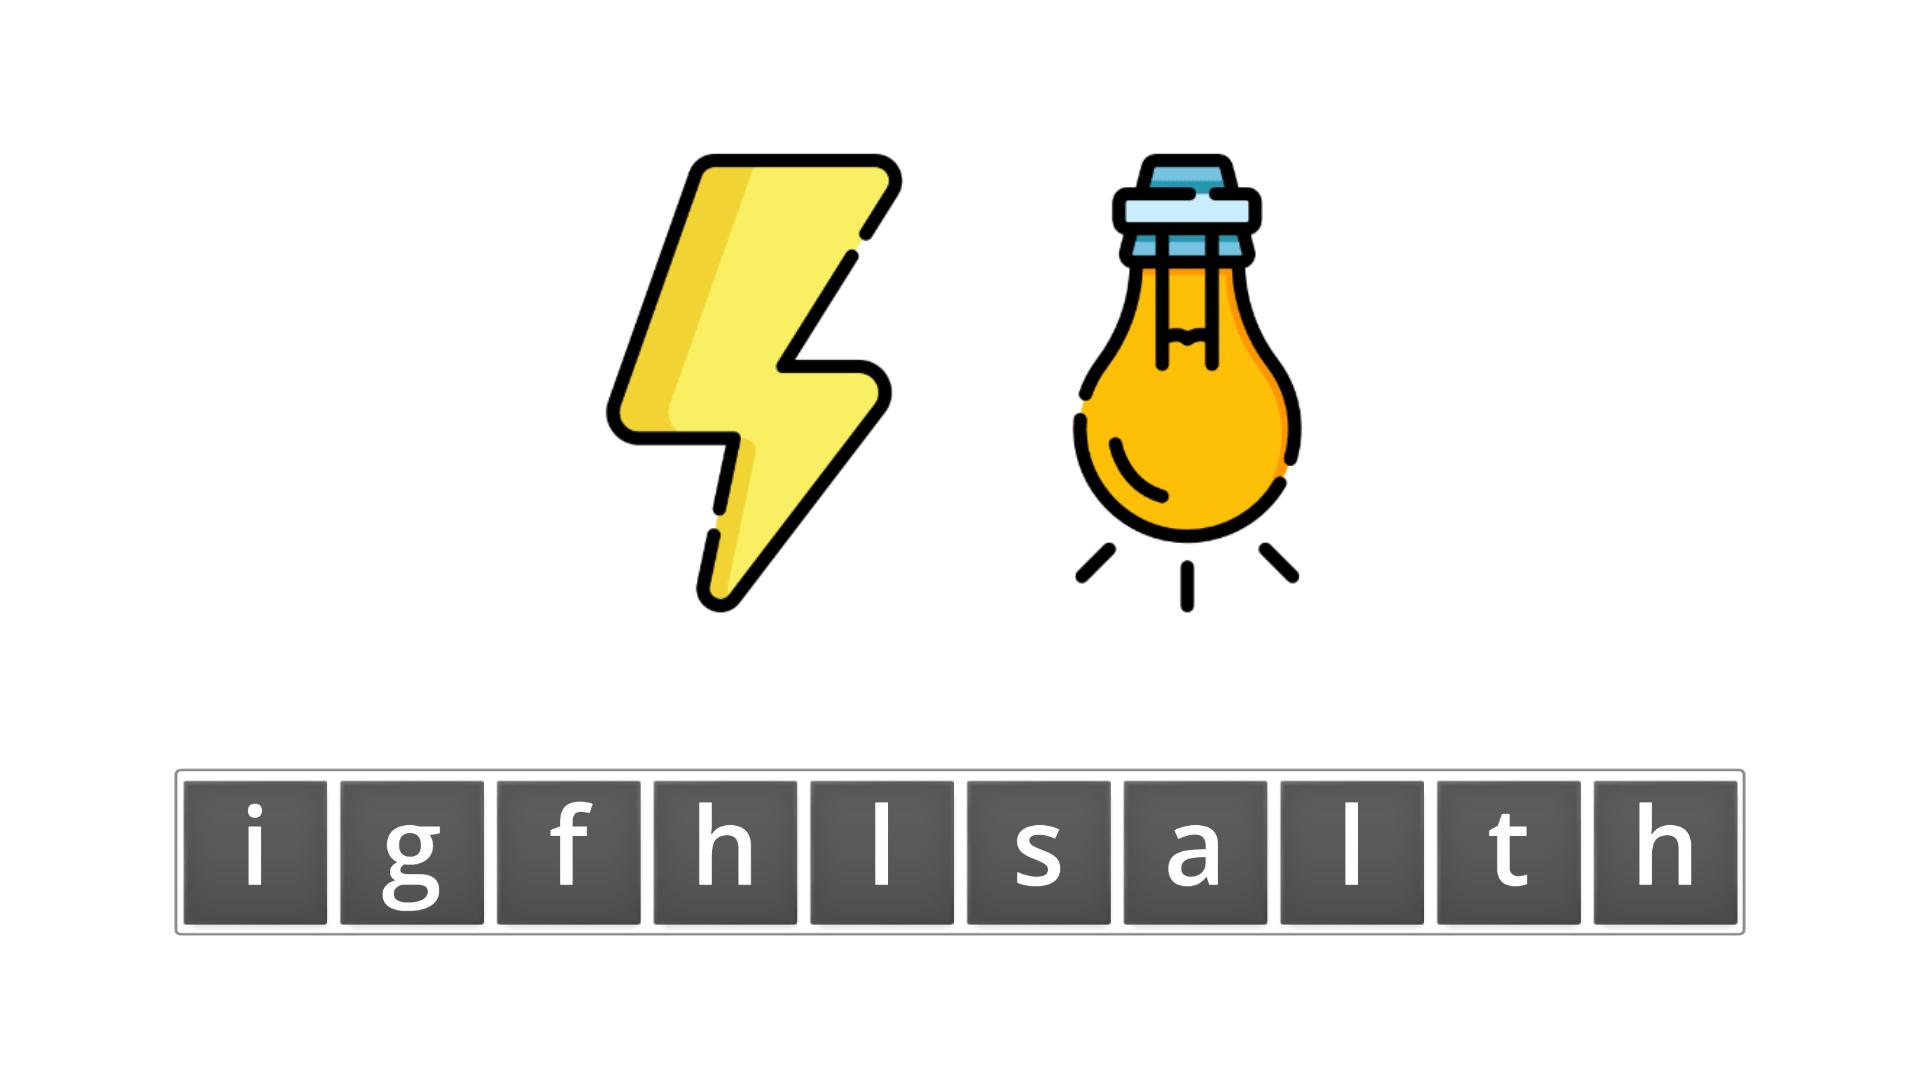 esl resources - flashcards - compound nouns - unscramble - flashlight